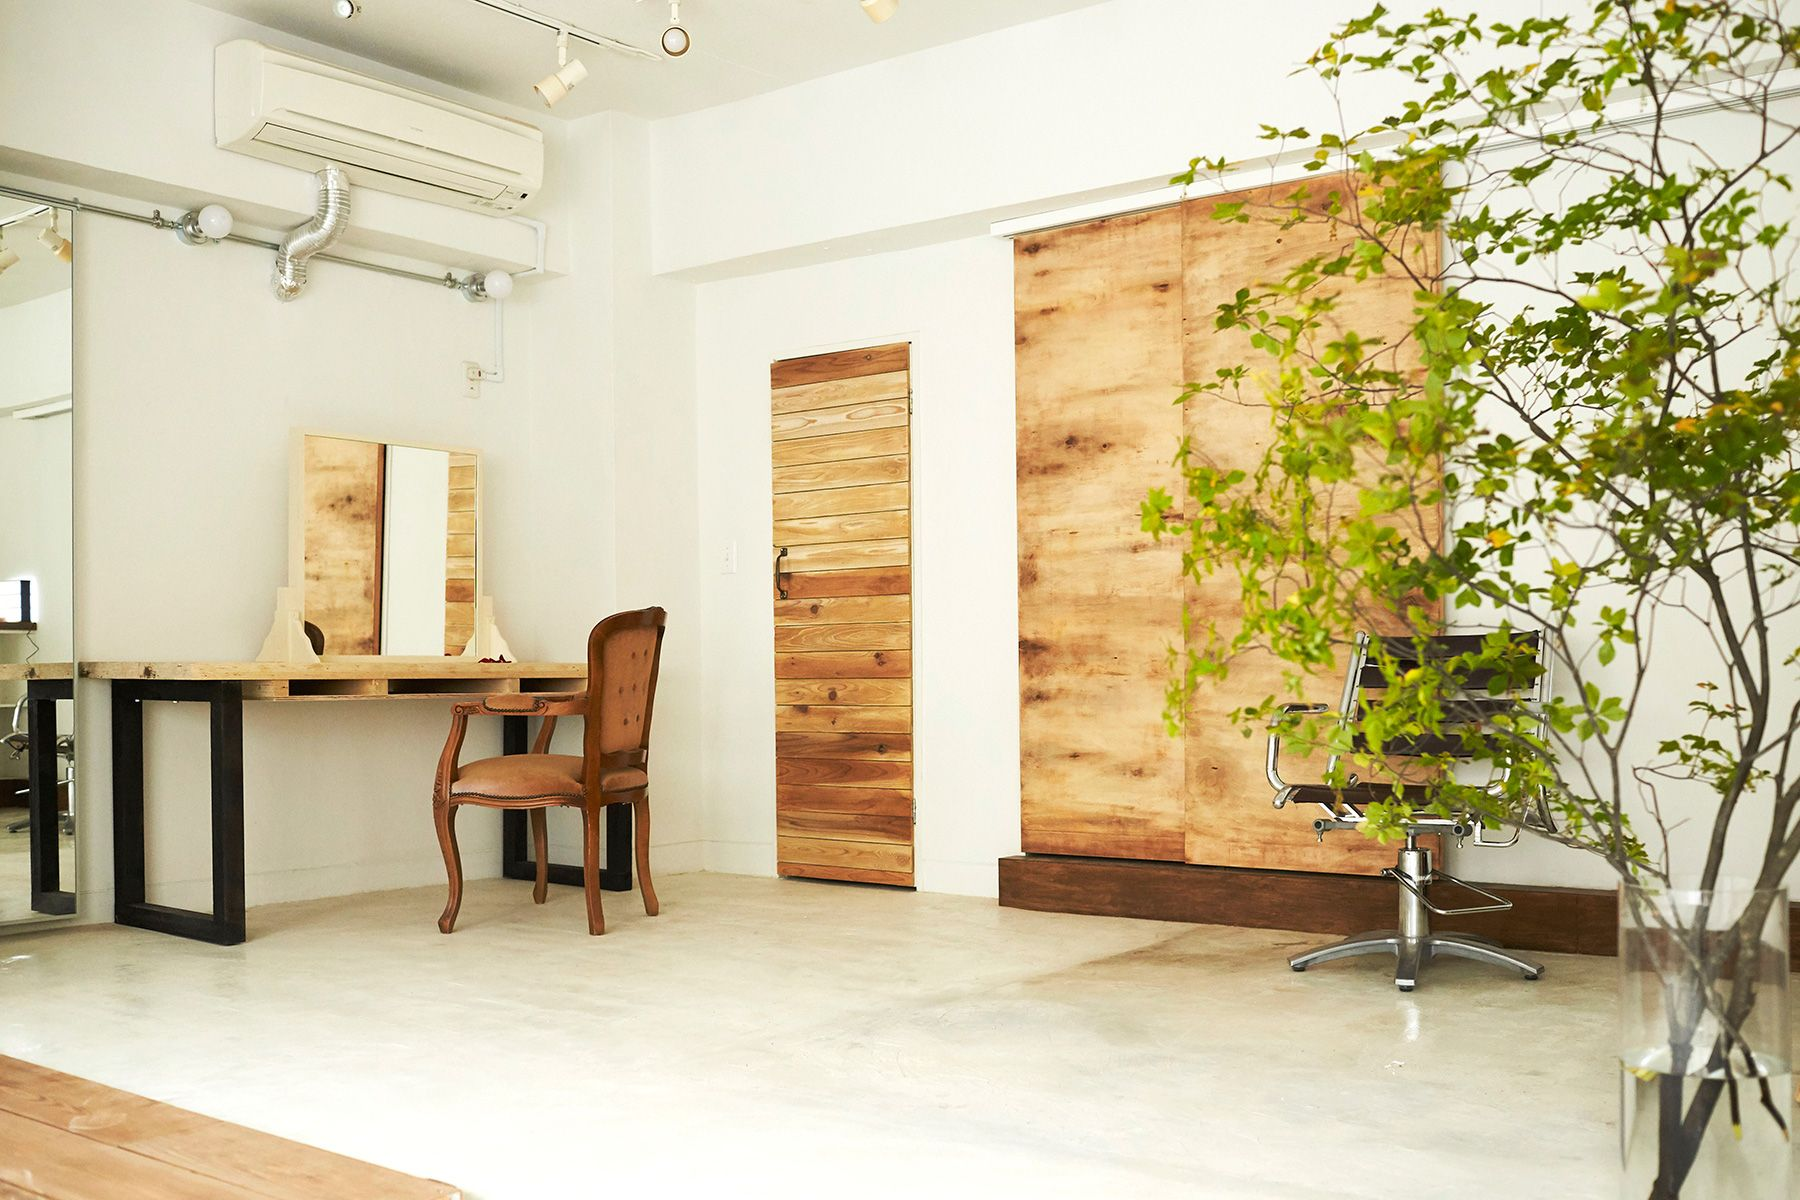 Studio & Rental Space  or (スタジオ オアー)メイクスペース